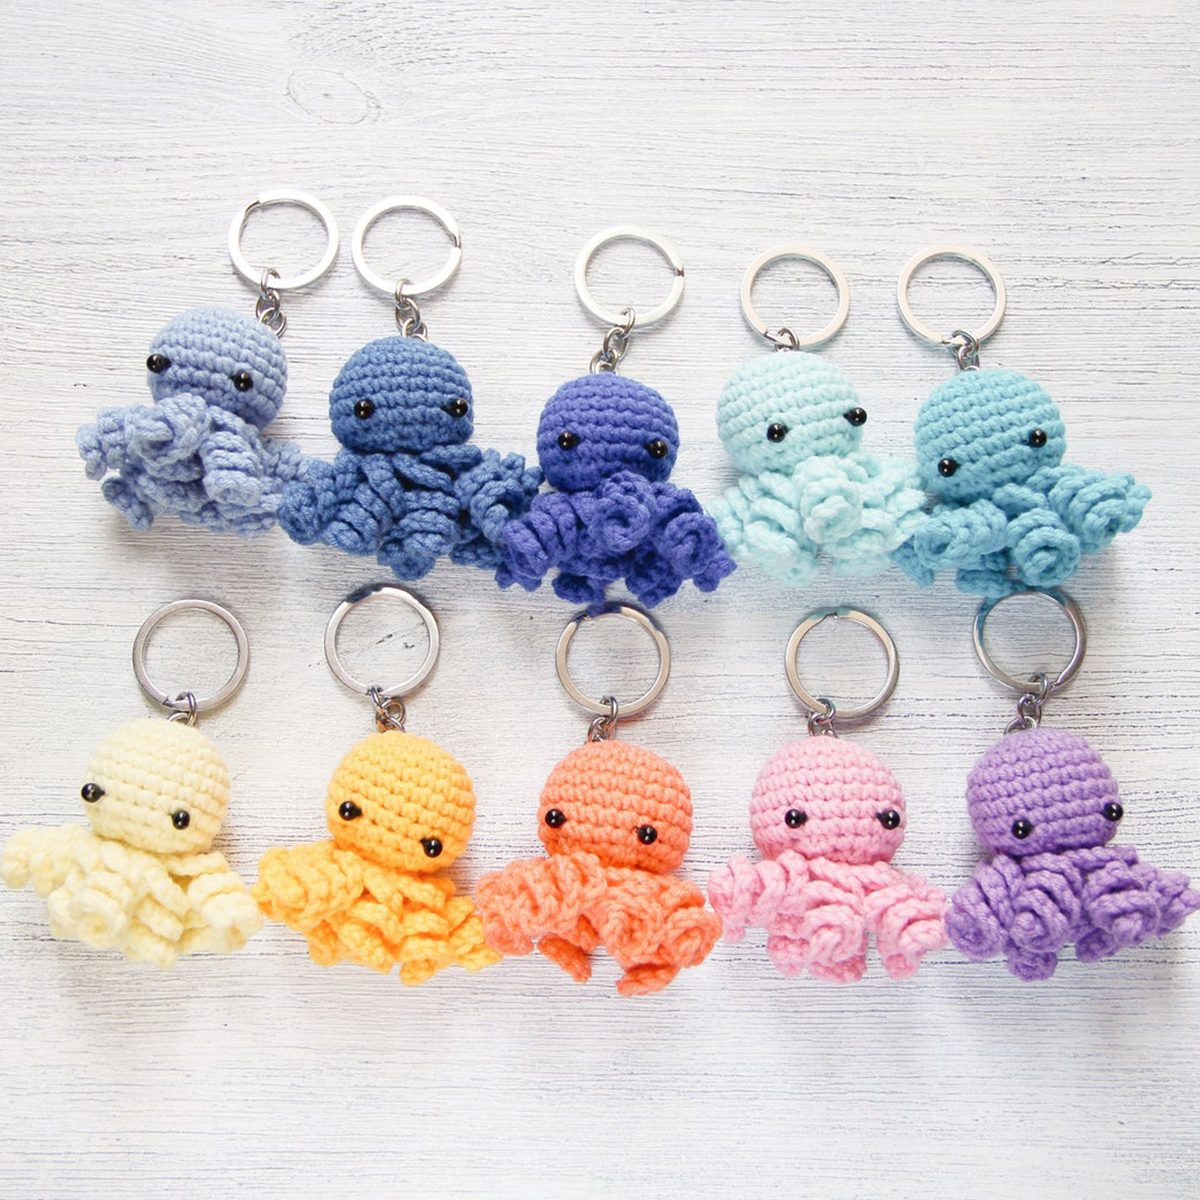 Crochet keychain octopus toy